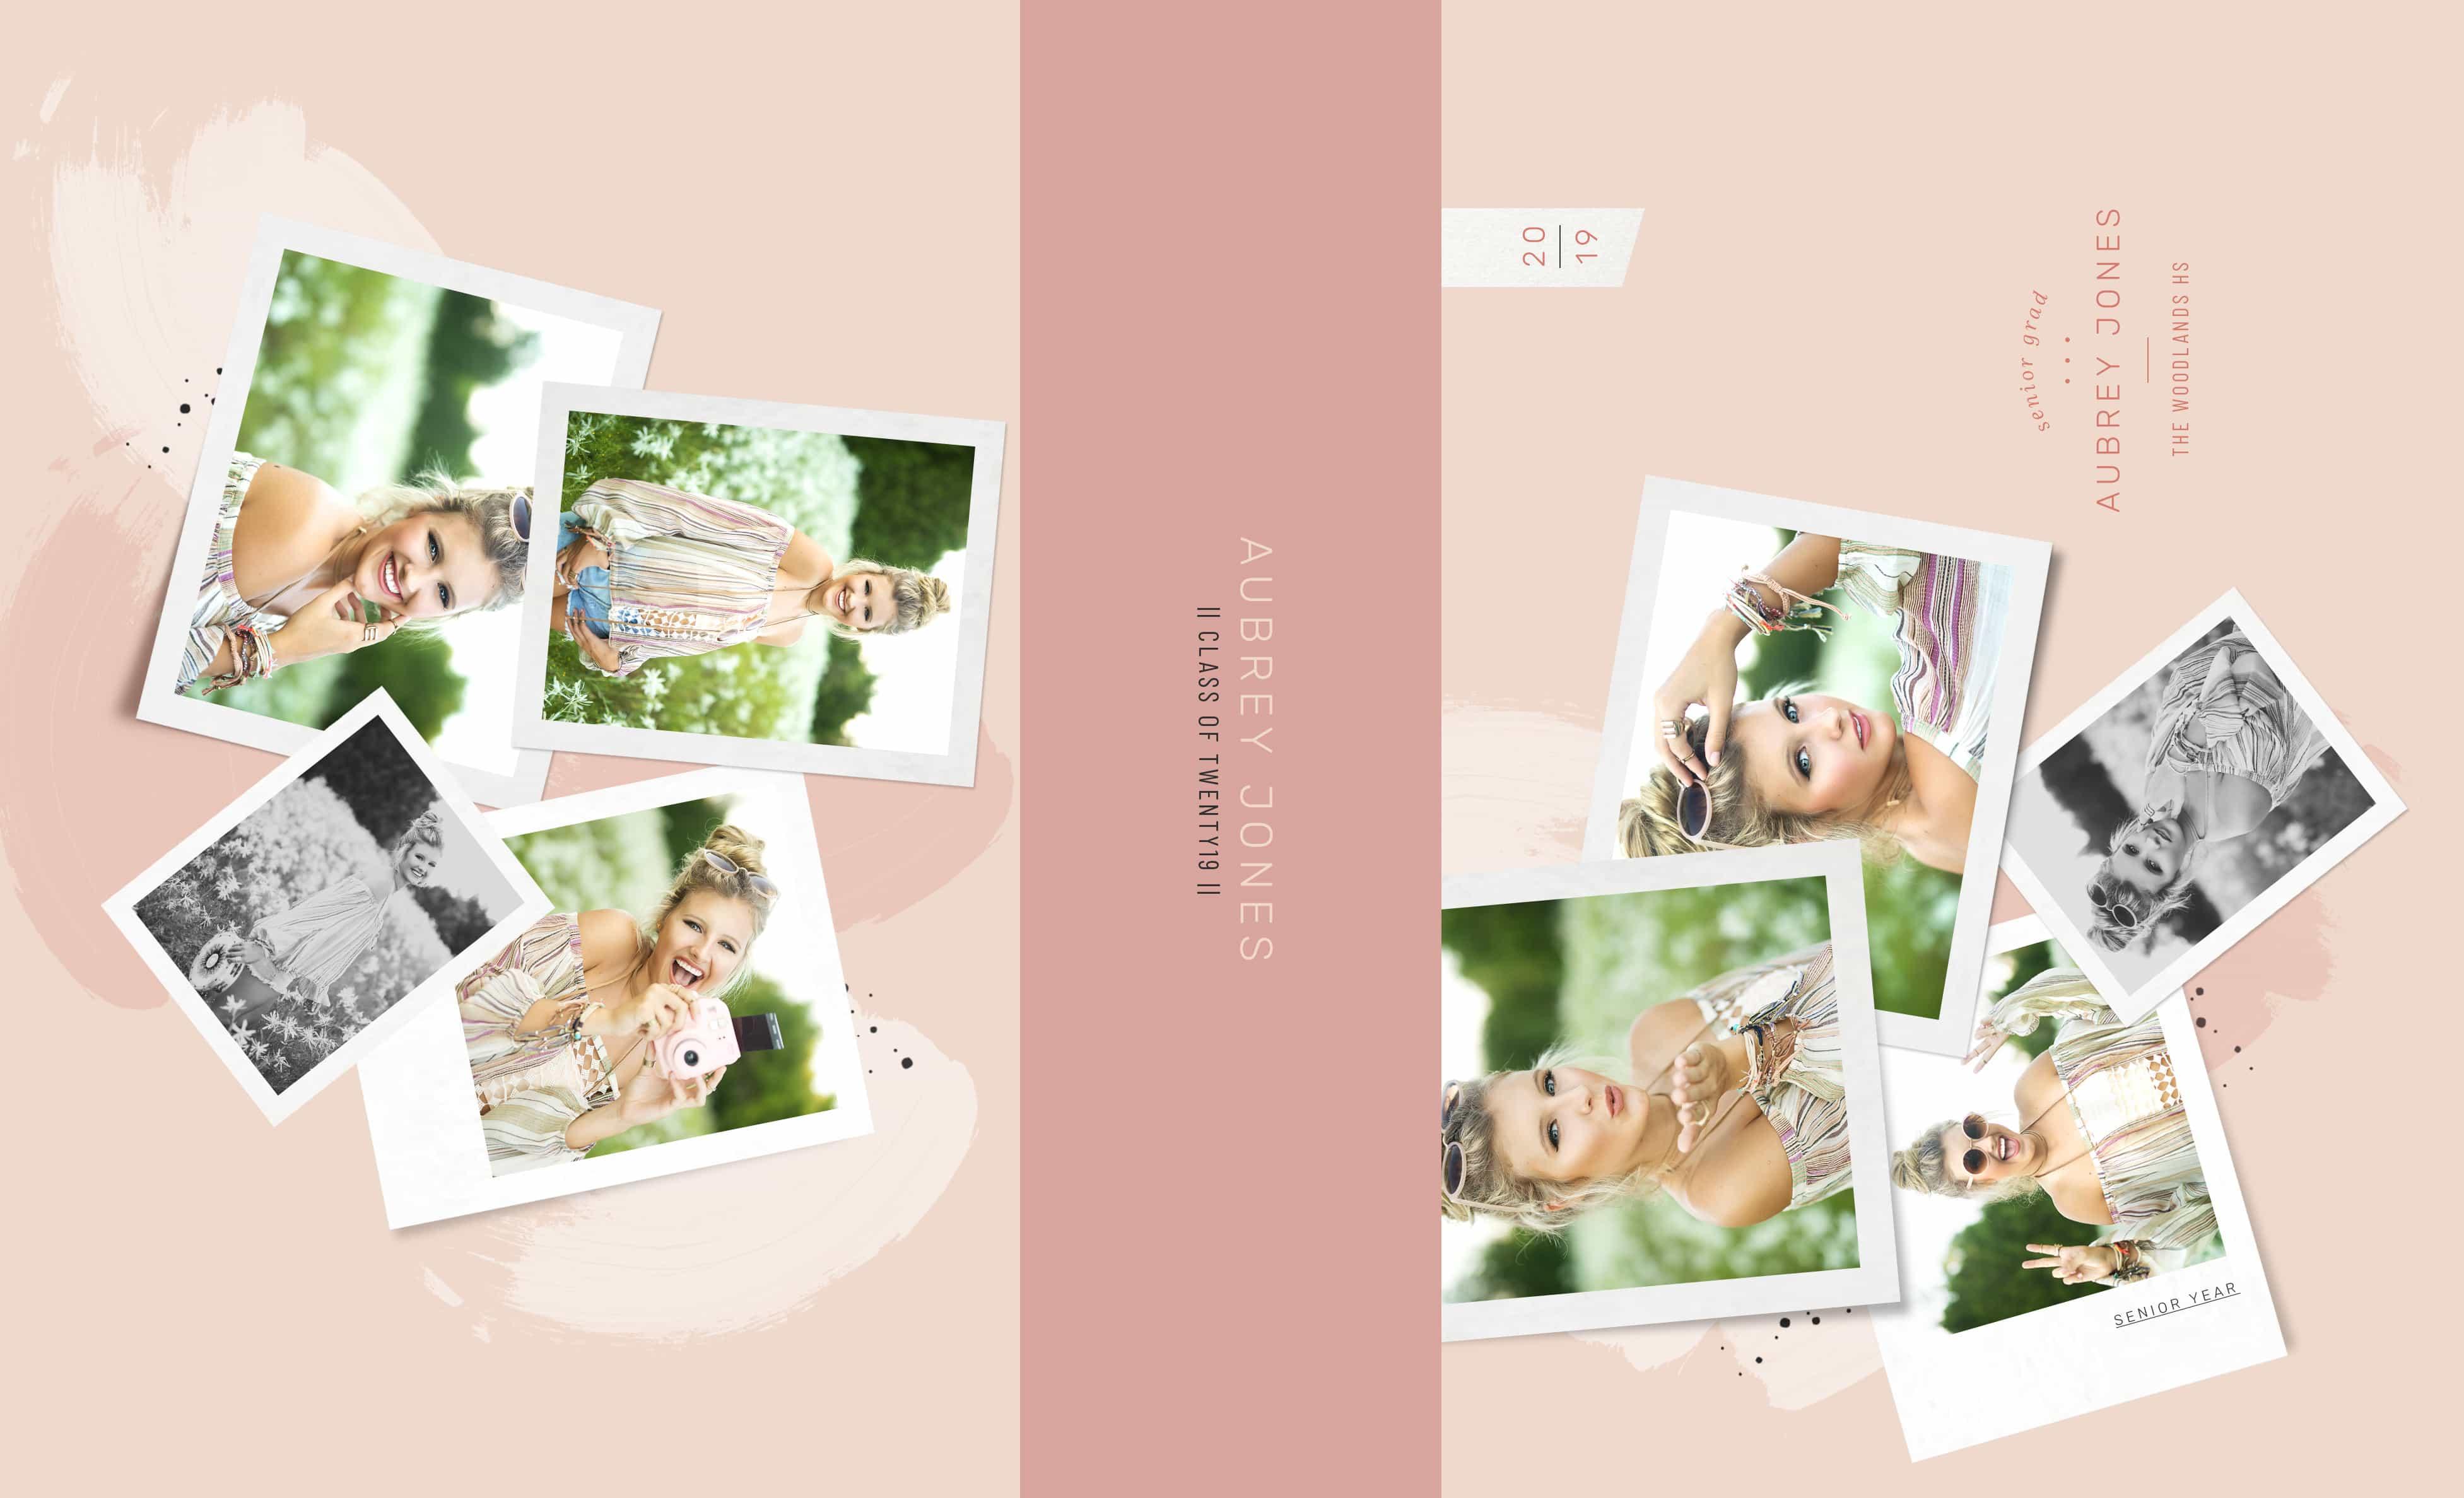 Brushed Bliss Designer Image Boxes